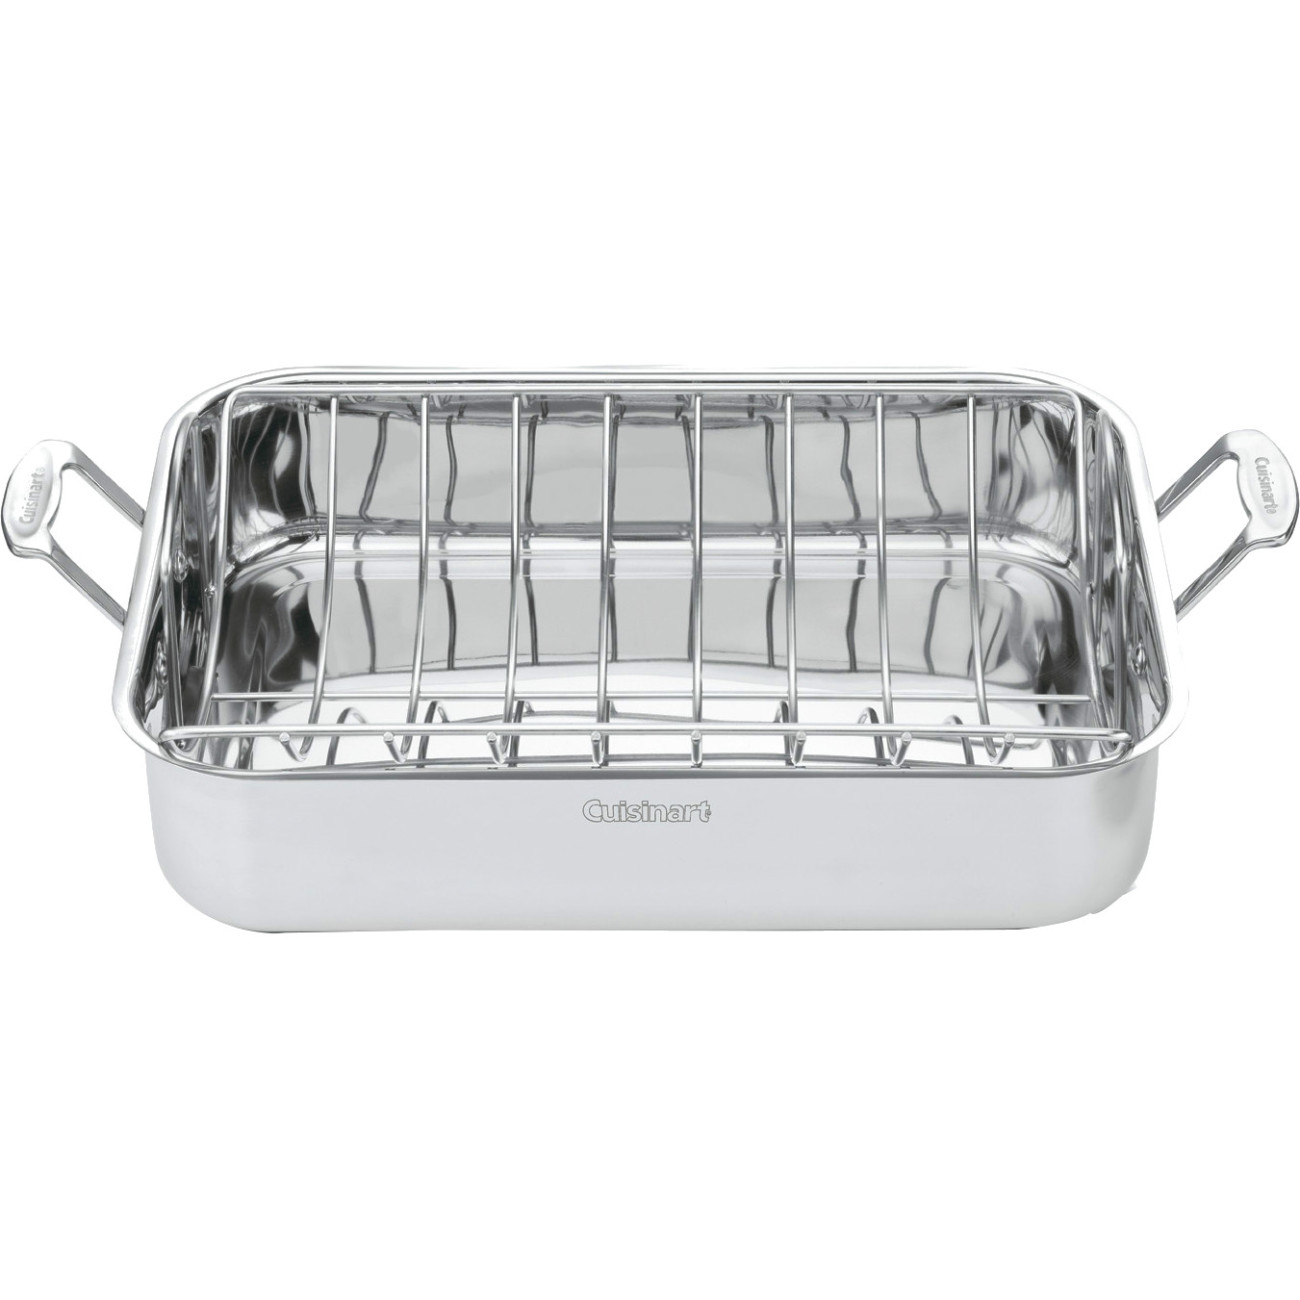 "Cuisinart 16"" Roasting Pan with Rack - Roaster Pan, Roasting Rack - Stainless Steel - Dishwasher Safe - Oven Safe"